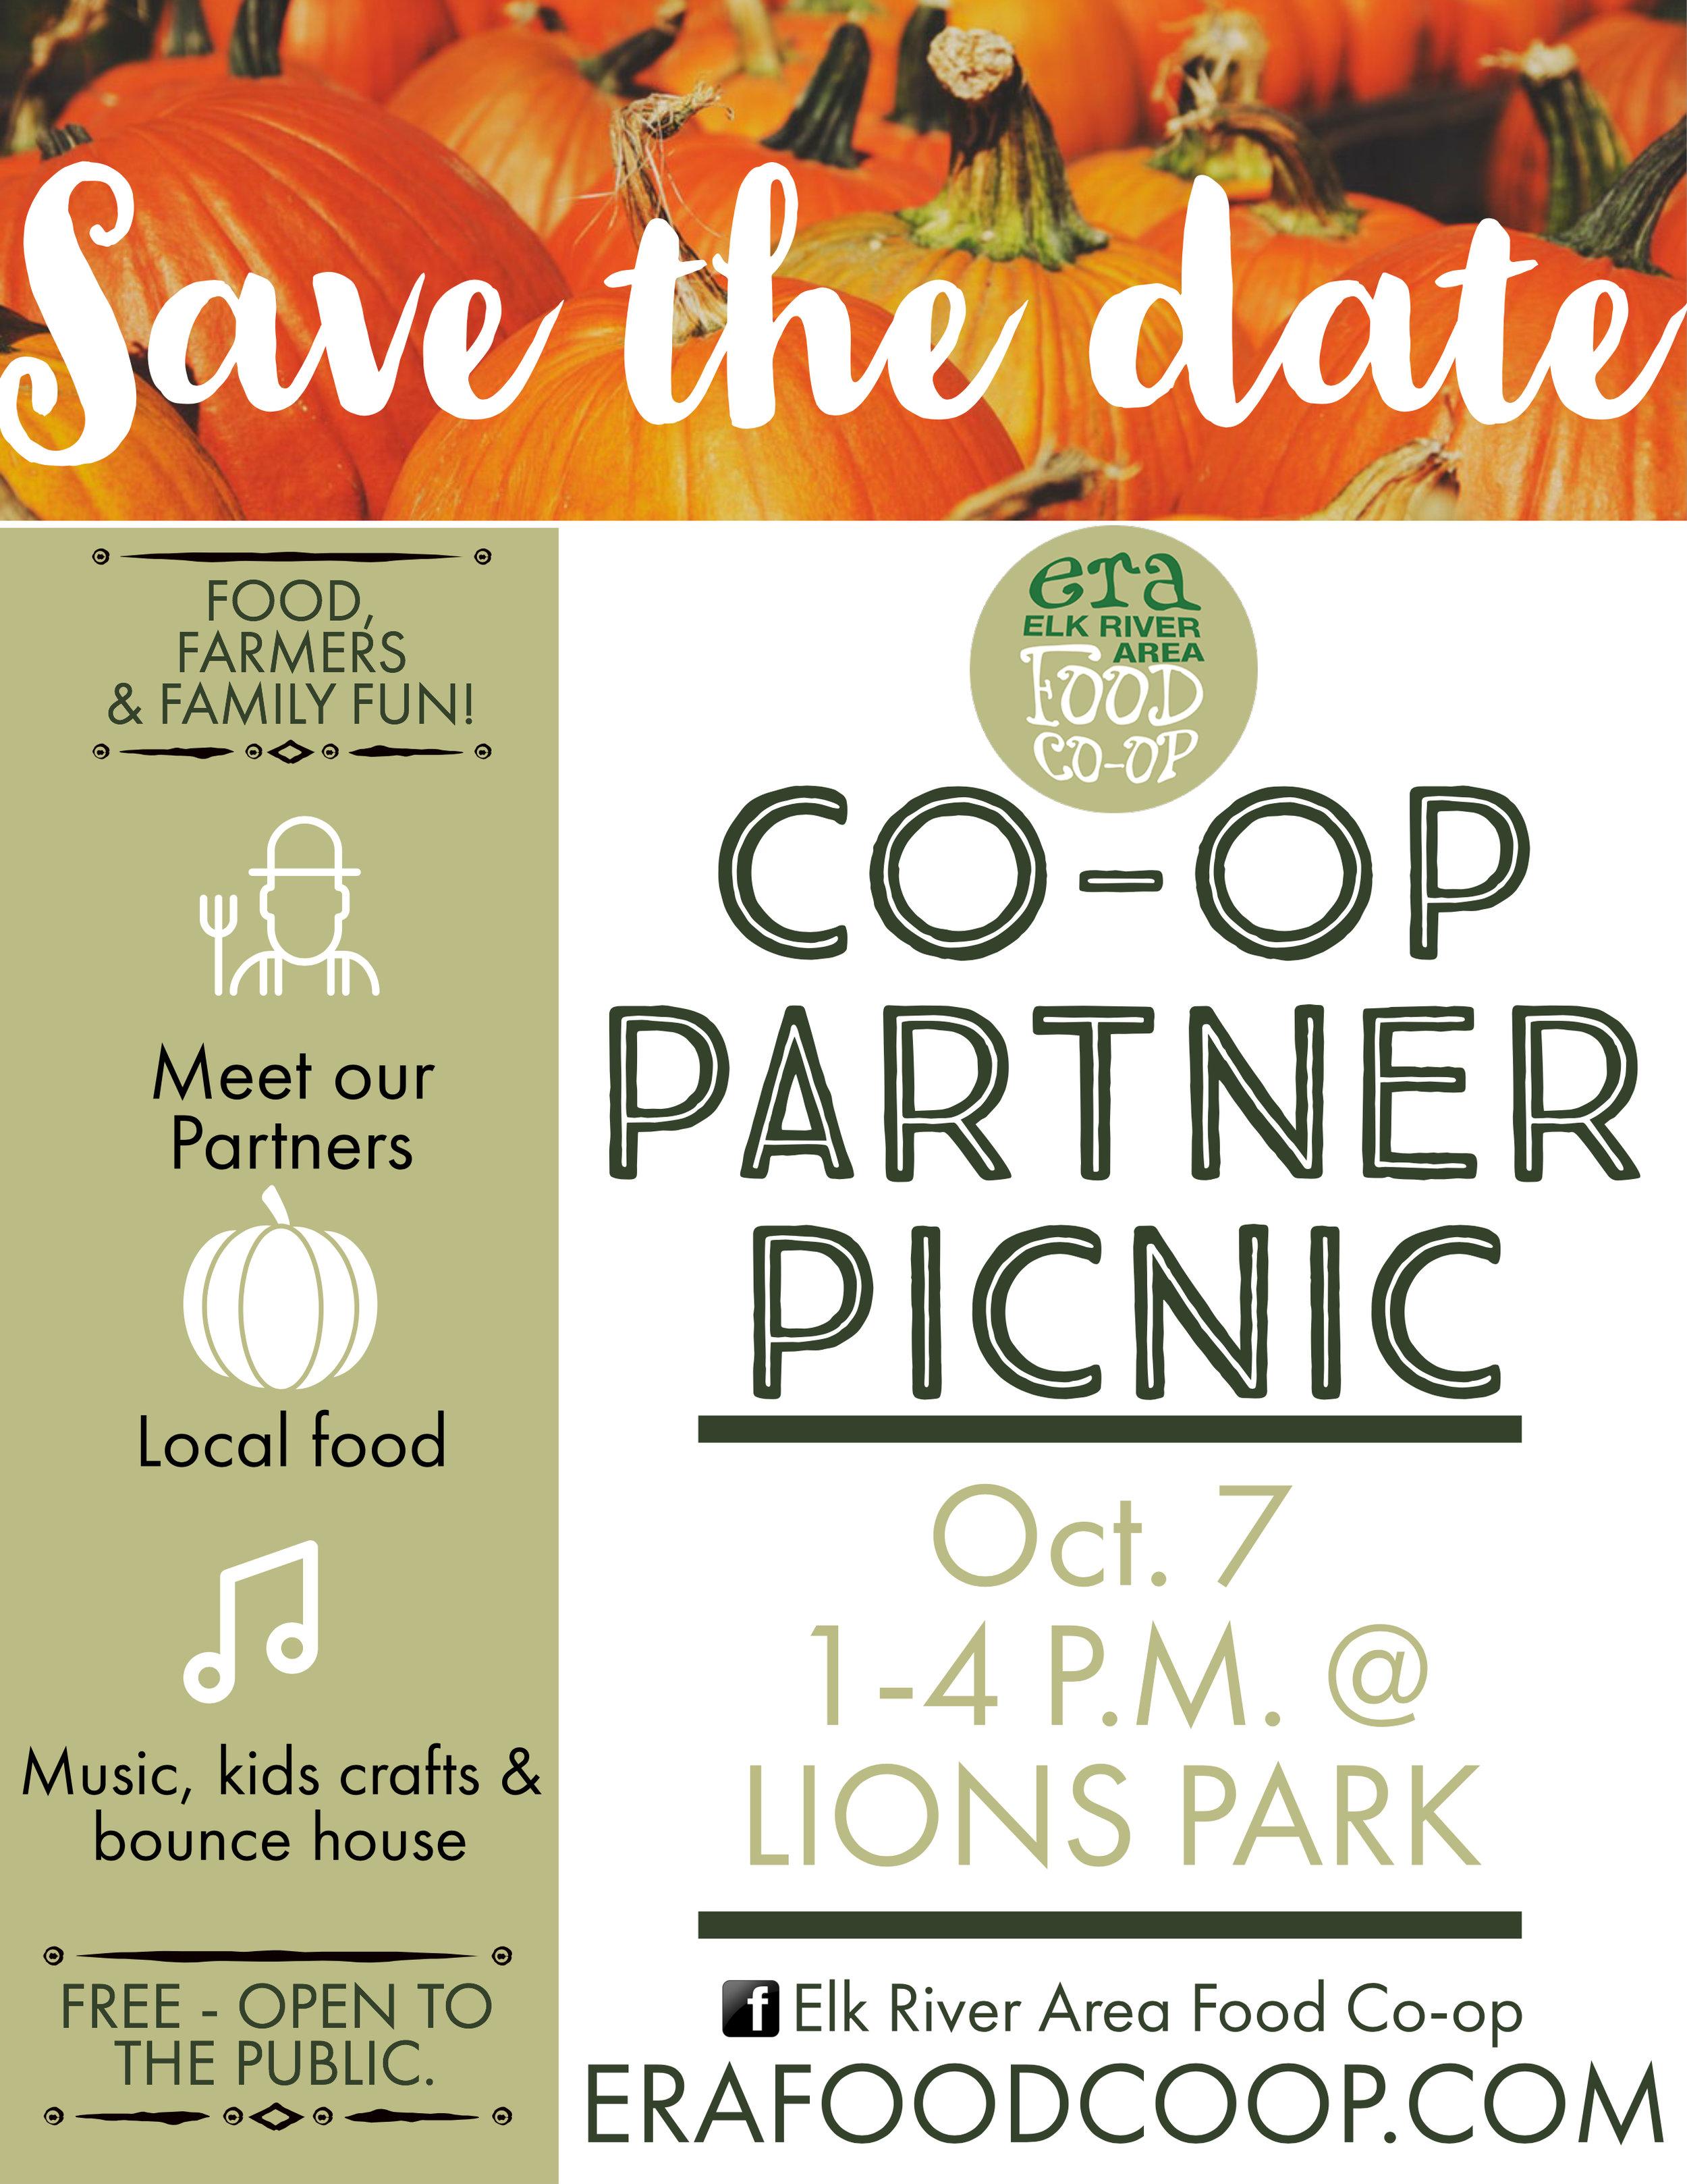 Elk River Area Food Co-op Partner Picnic